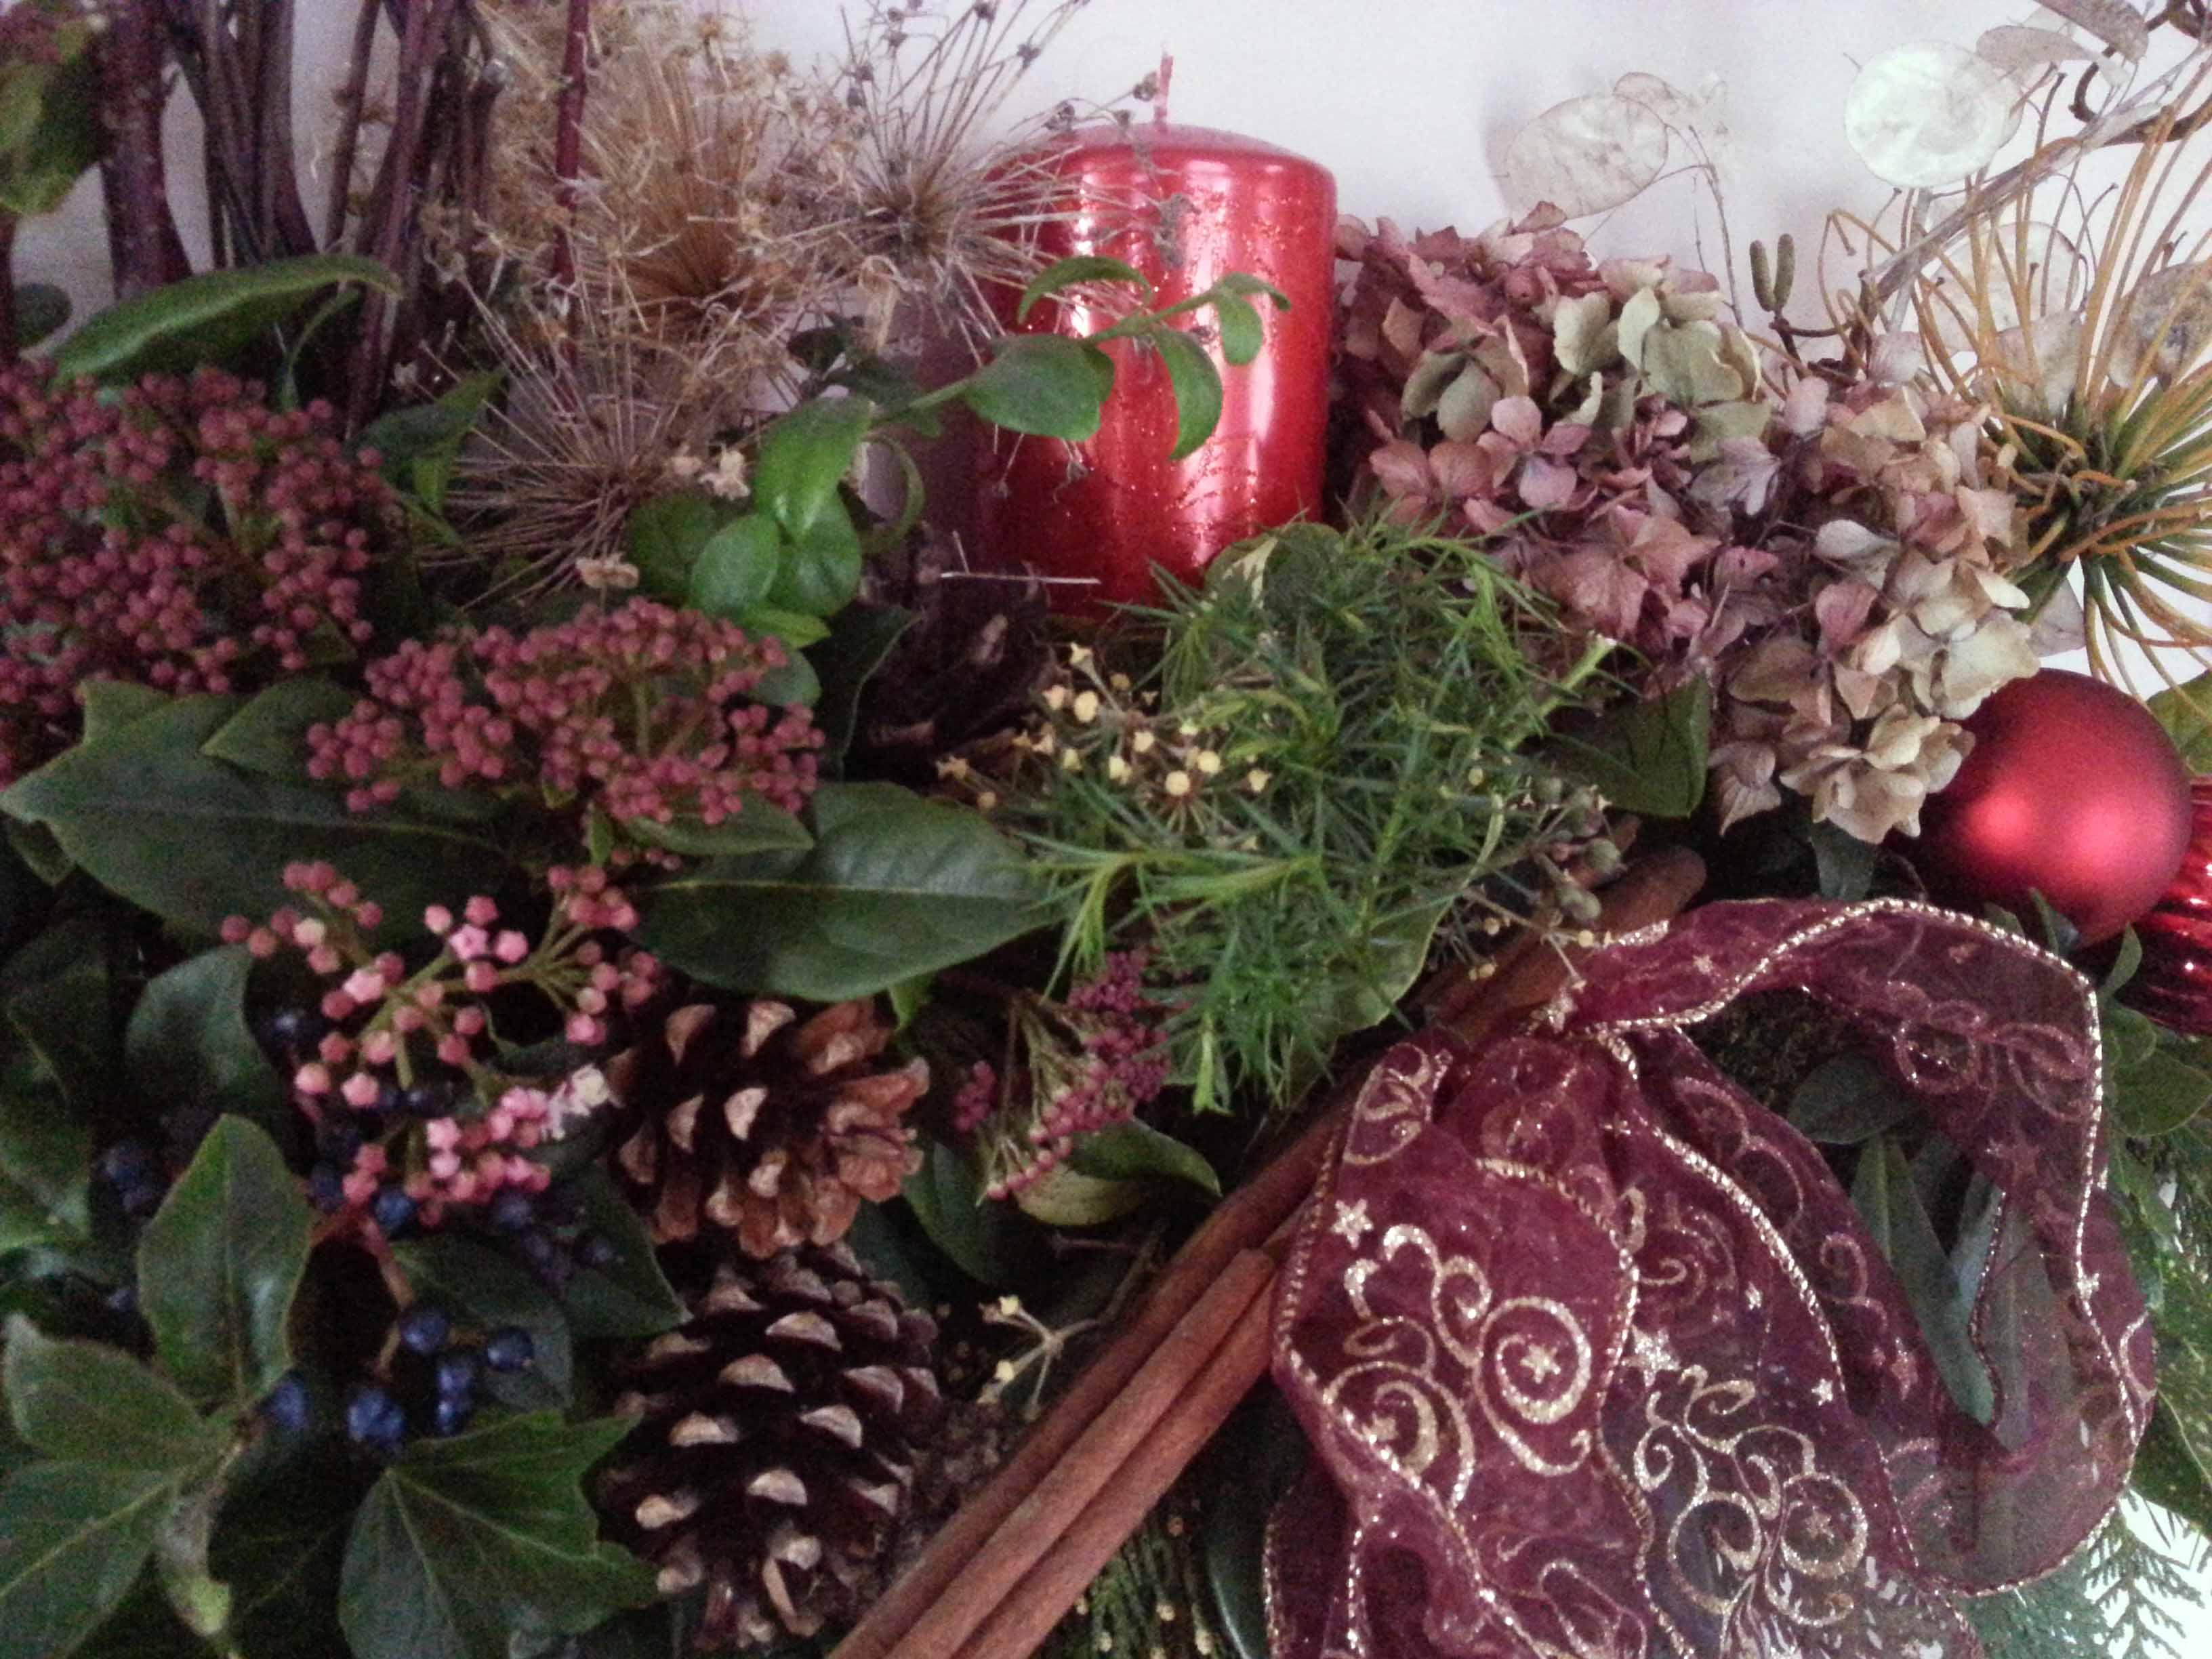 Vibernum & Dried Hydrangeas, Allium Seed Heads & Pine Cones